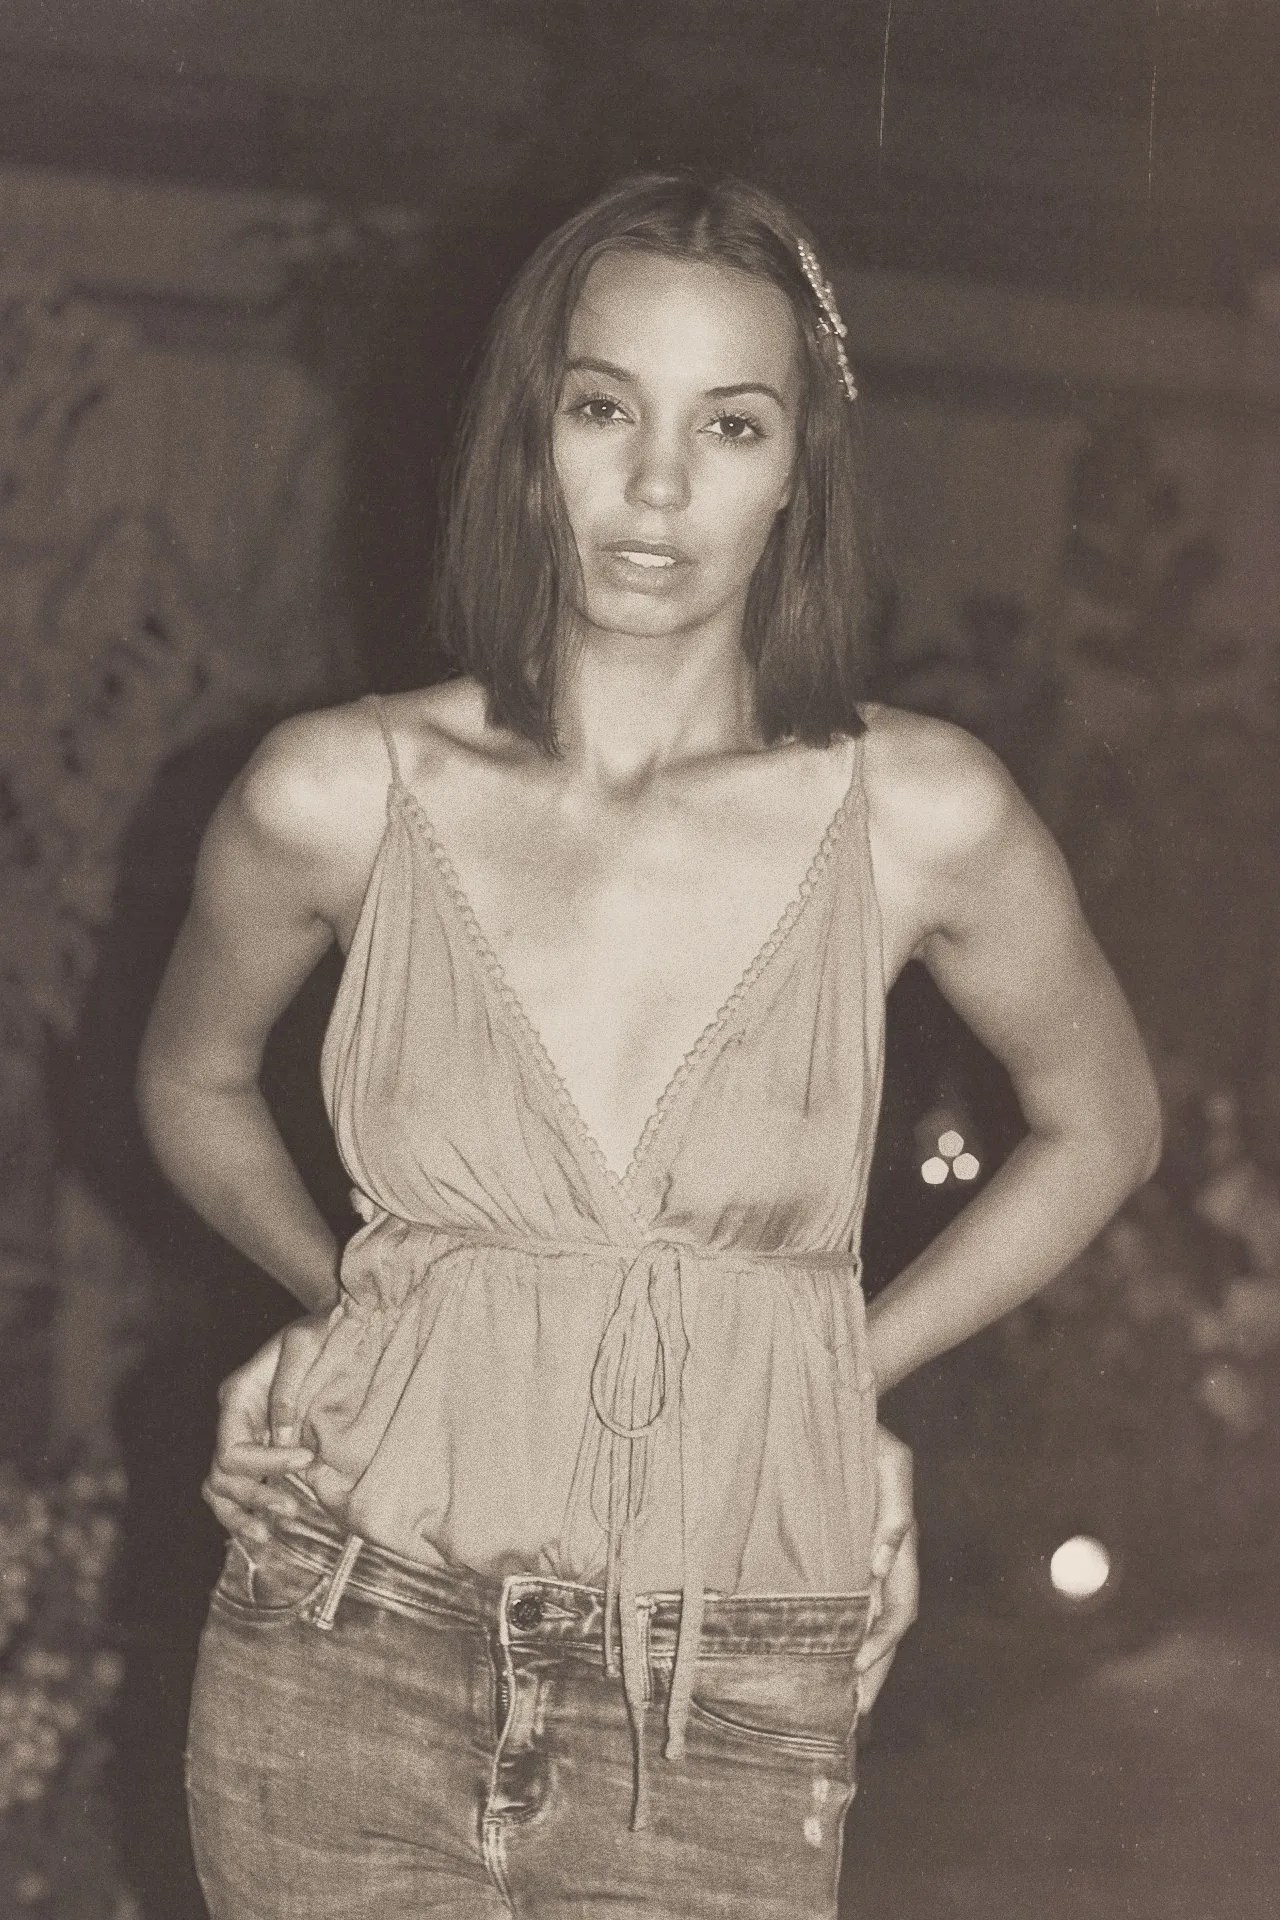 Male entitlement - UK lifestyle blog - The Style of Laura Jane